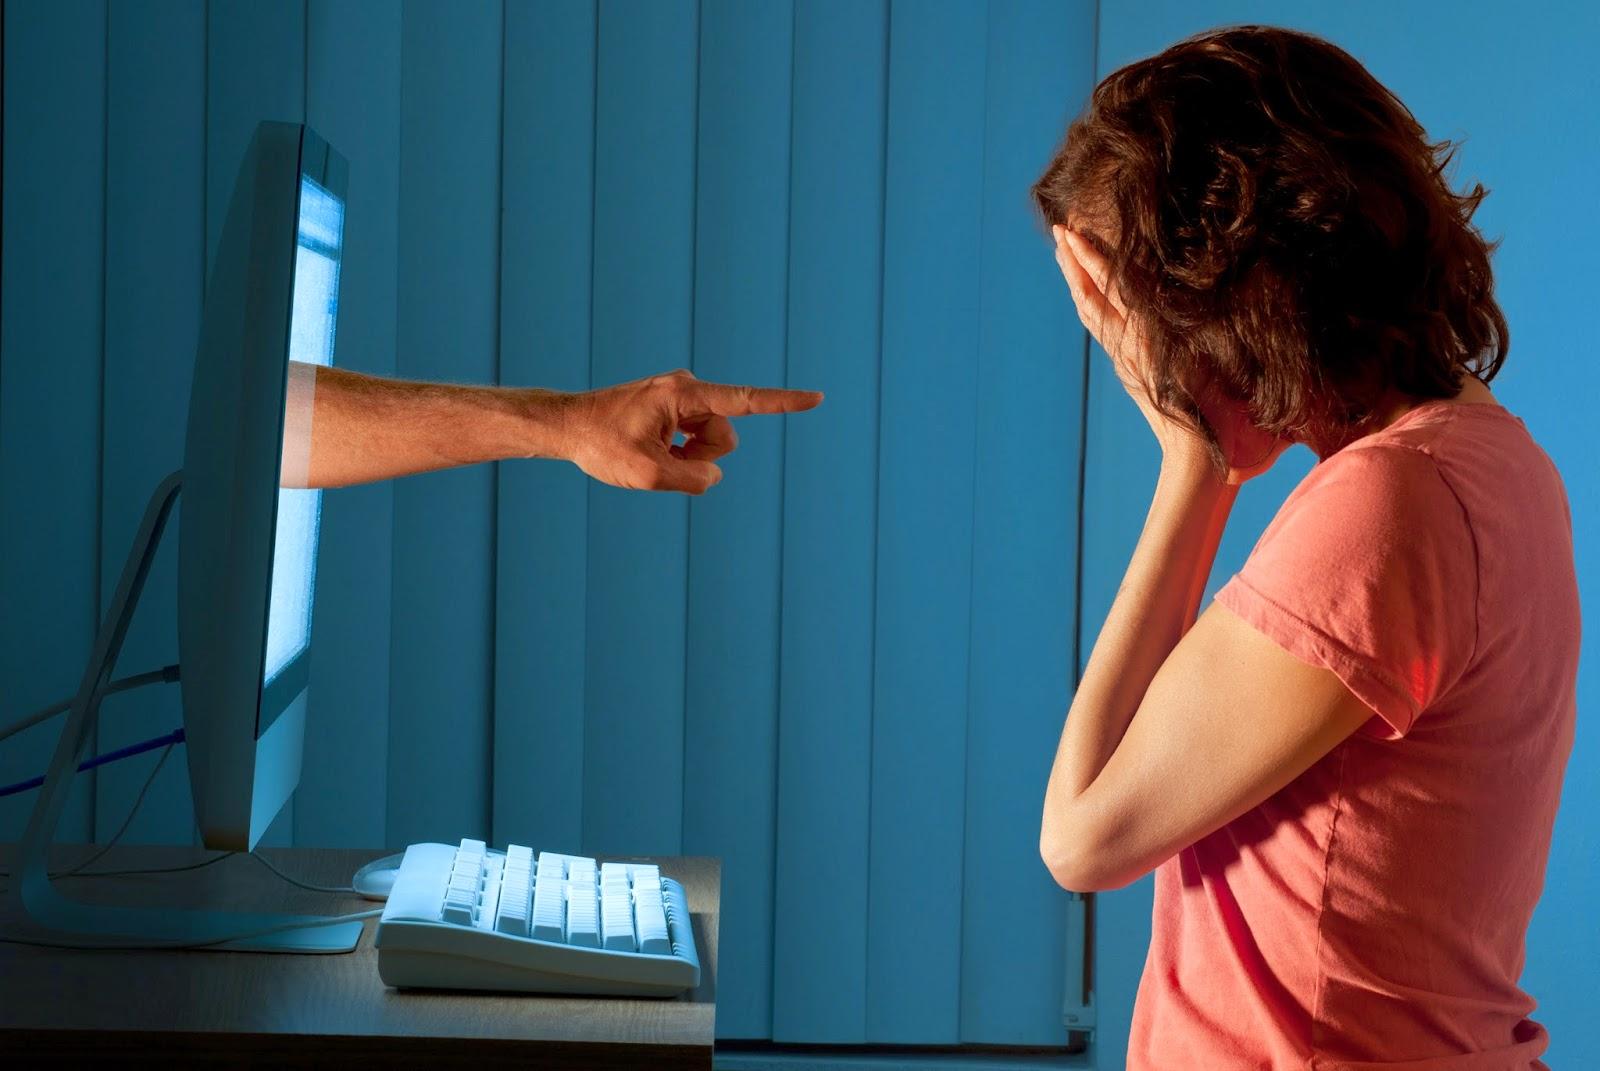 post 13 El ciberbullying